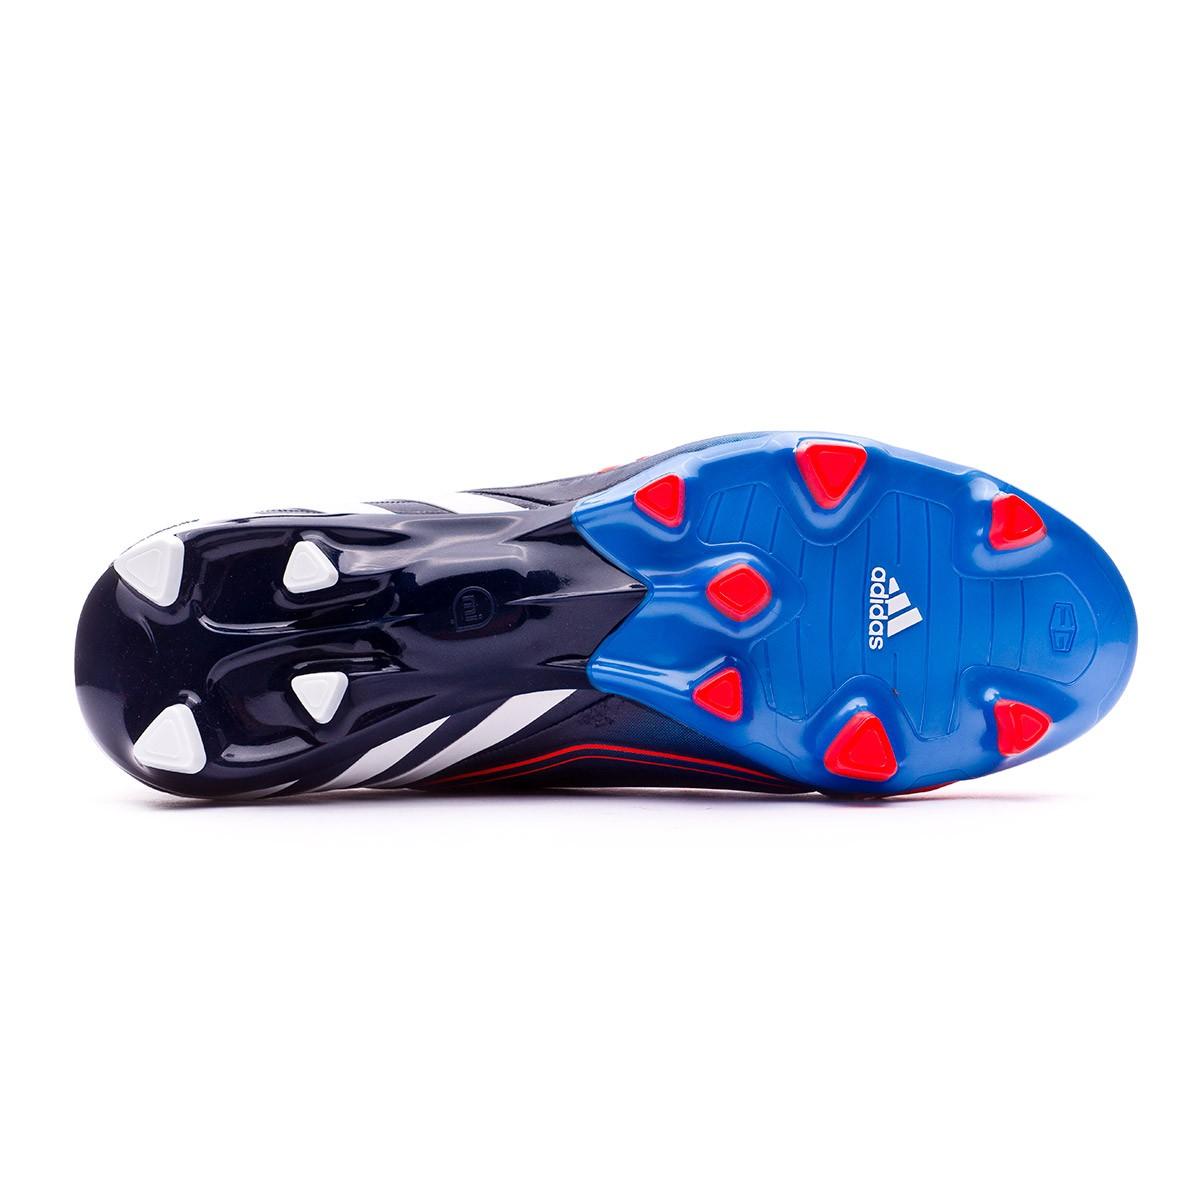 sale retailer e1b71 a884d Bota de fútbol adidas Predator LZ TRX FG Azul-Blanco-Infrarrojo -  Soloporteros es ahora Fútbol Emotion